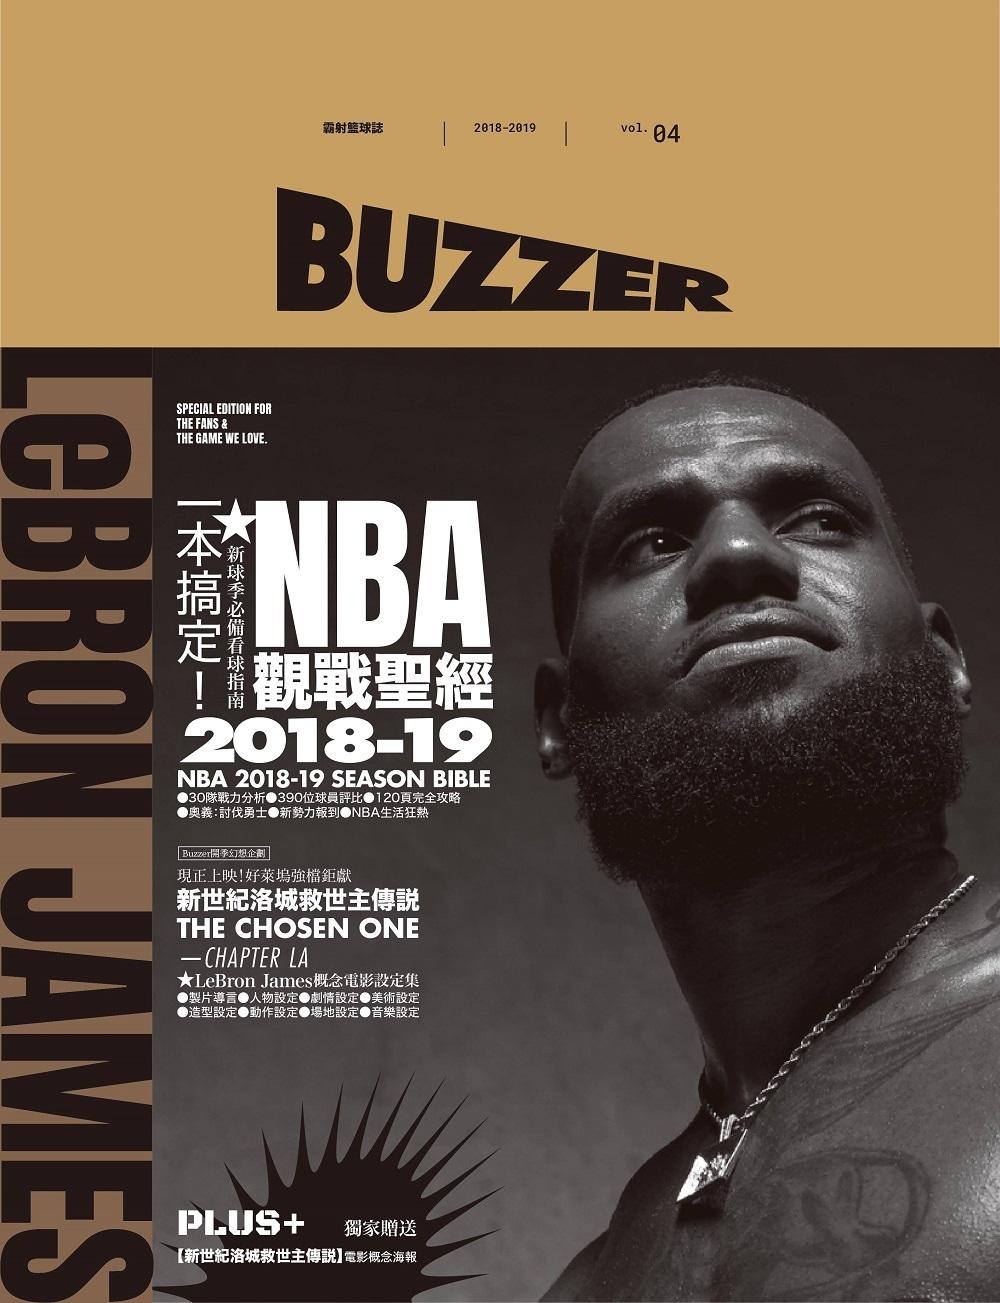 Buzzer 霸射籃球誌 NBA 2018-19觀戰聖經